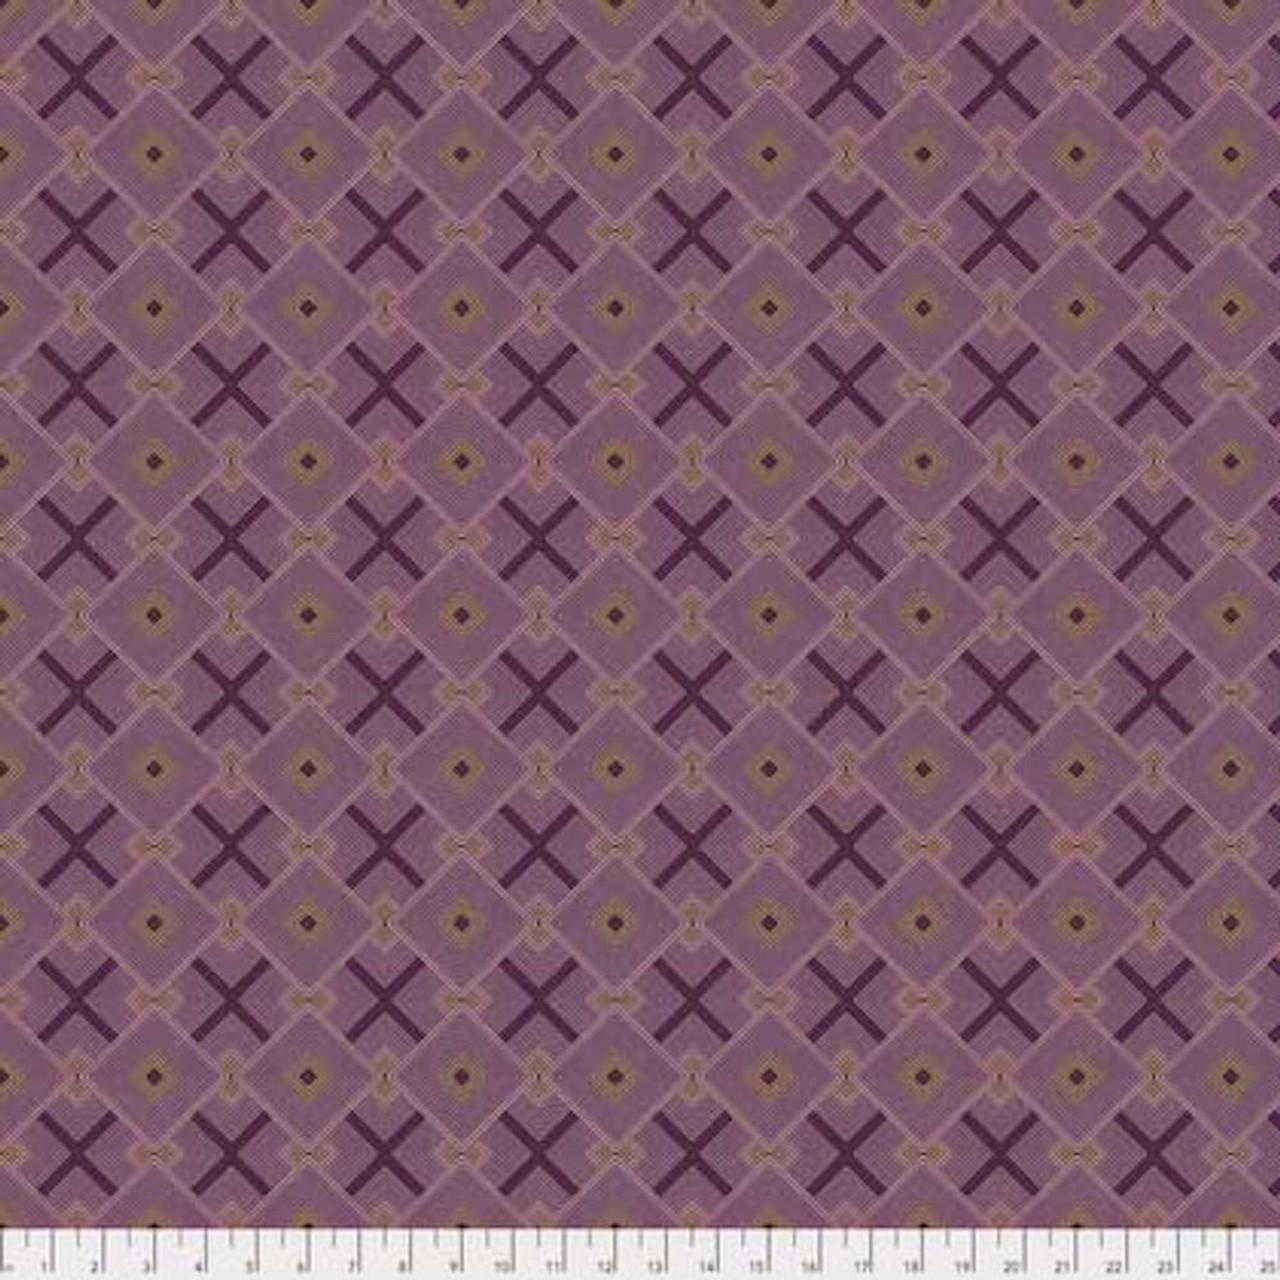 Joel Dewberry Avalon PWJD158 Squared Blush Cotton Fabric By Yd